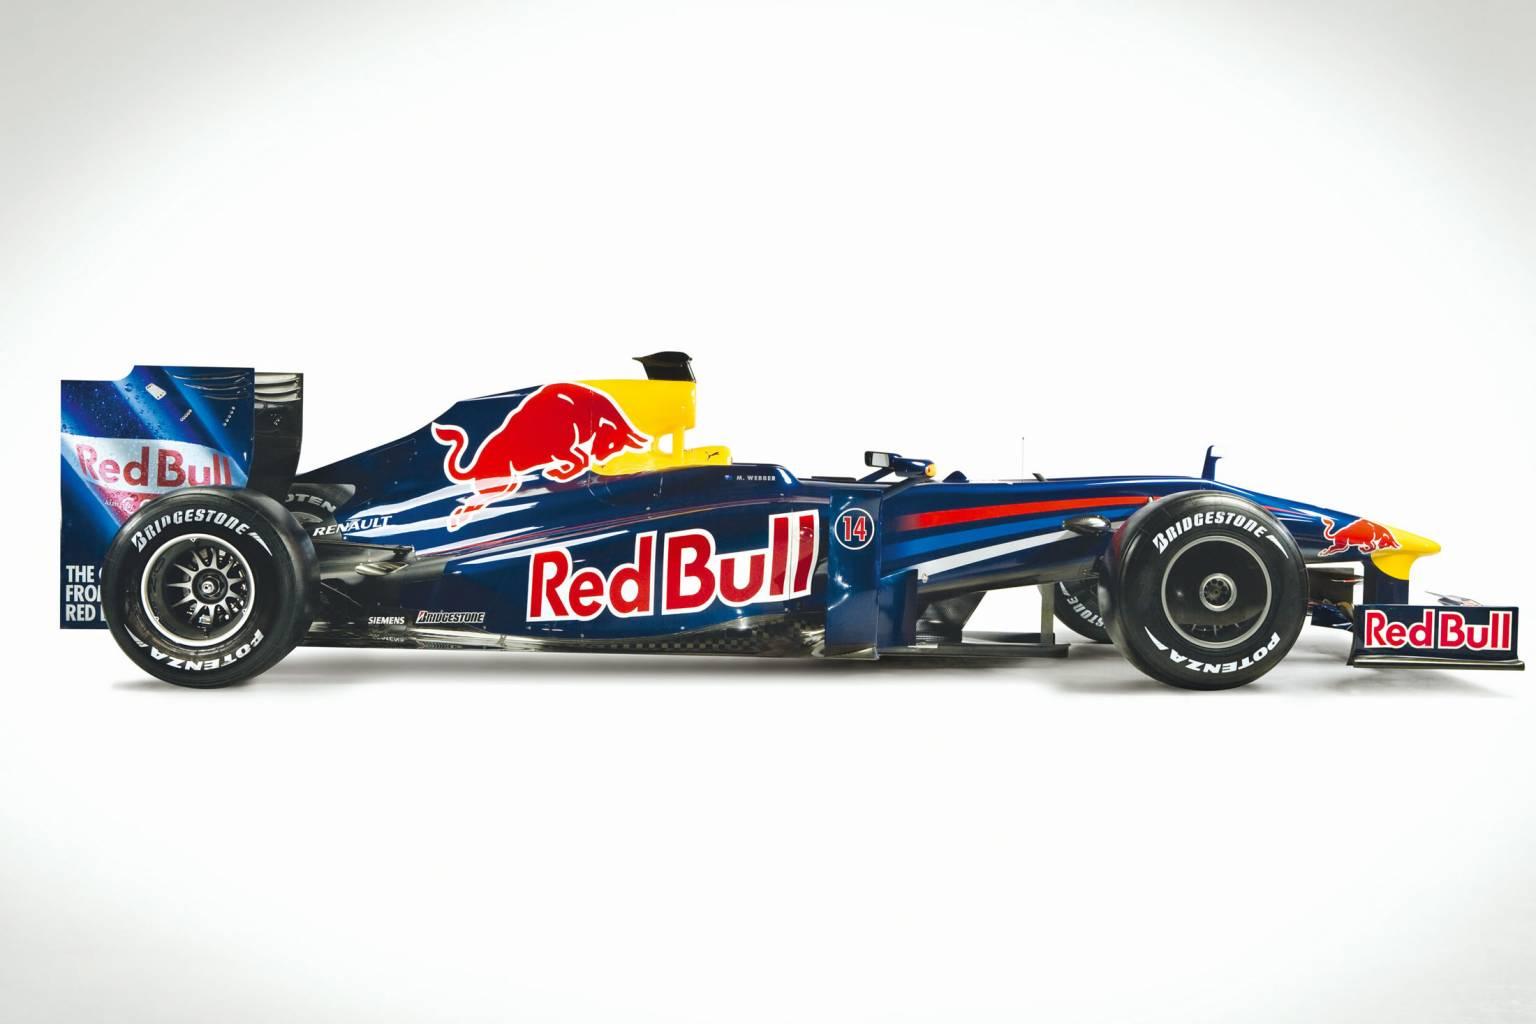 Redbull Rb5 Wallpaper F1 Car 2009: Presentation Red Bull RB5